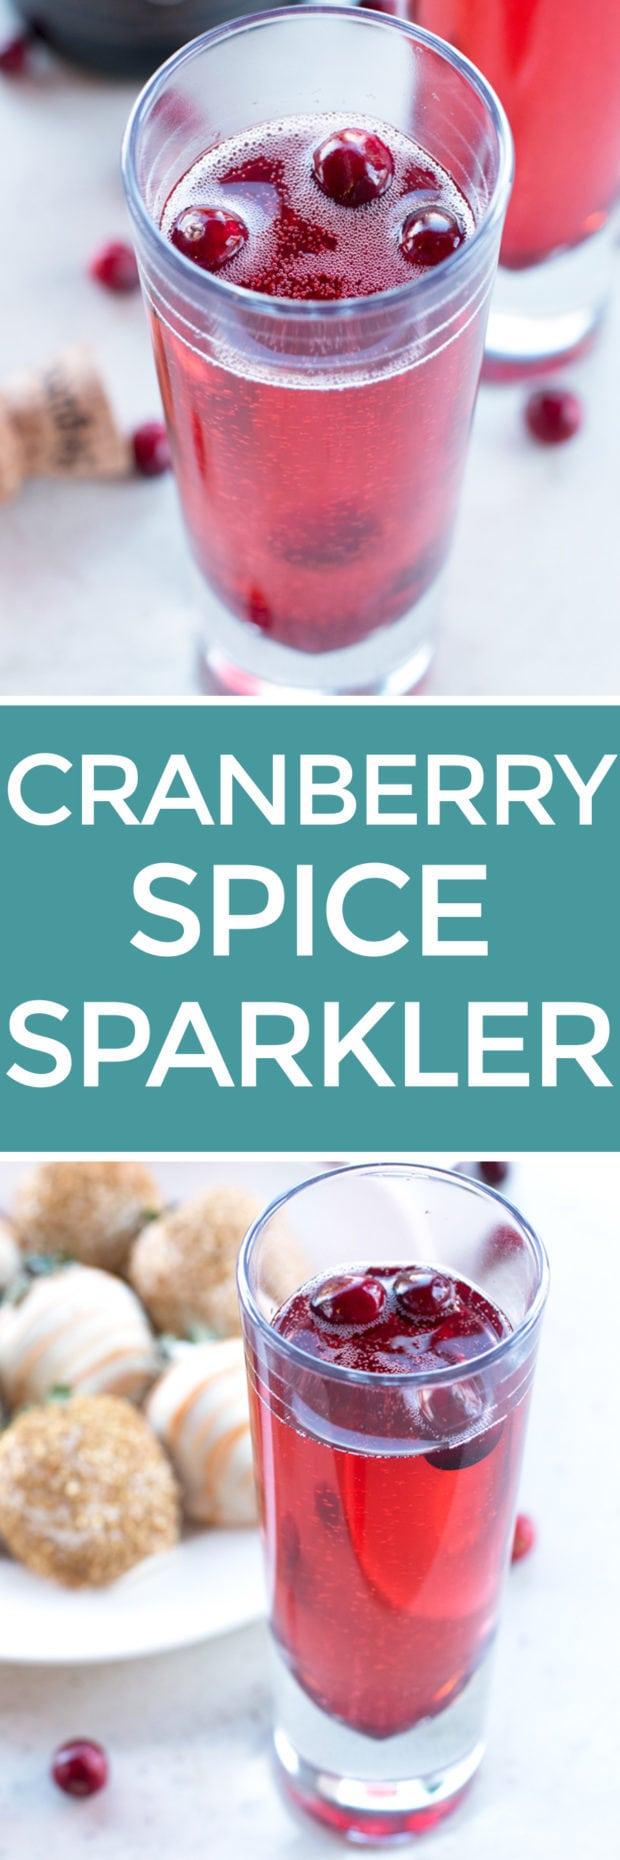 Cranberry Spice Sparkler | cakenknife.com #thanksgiving #cocktail